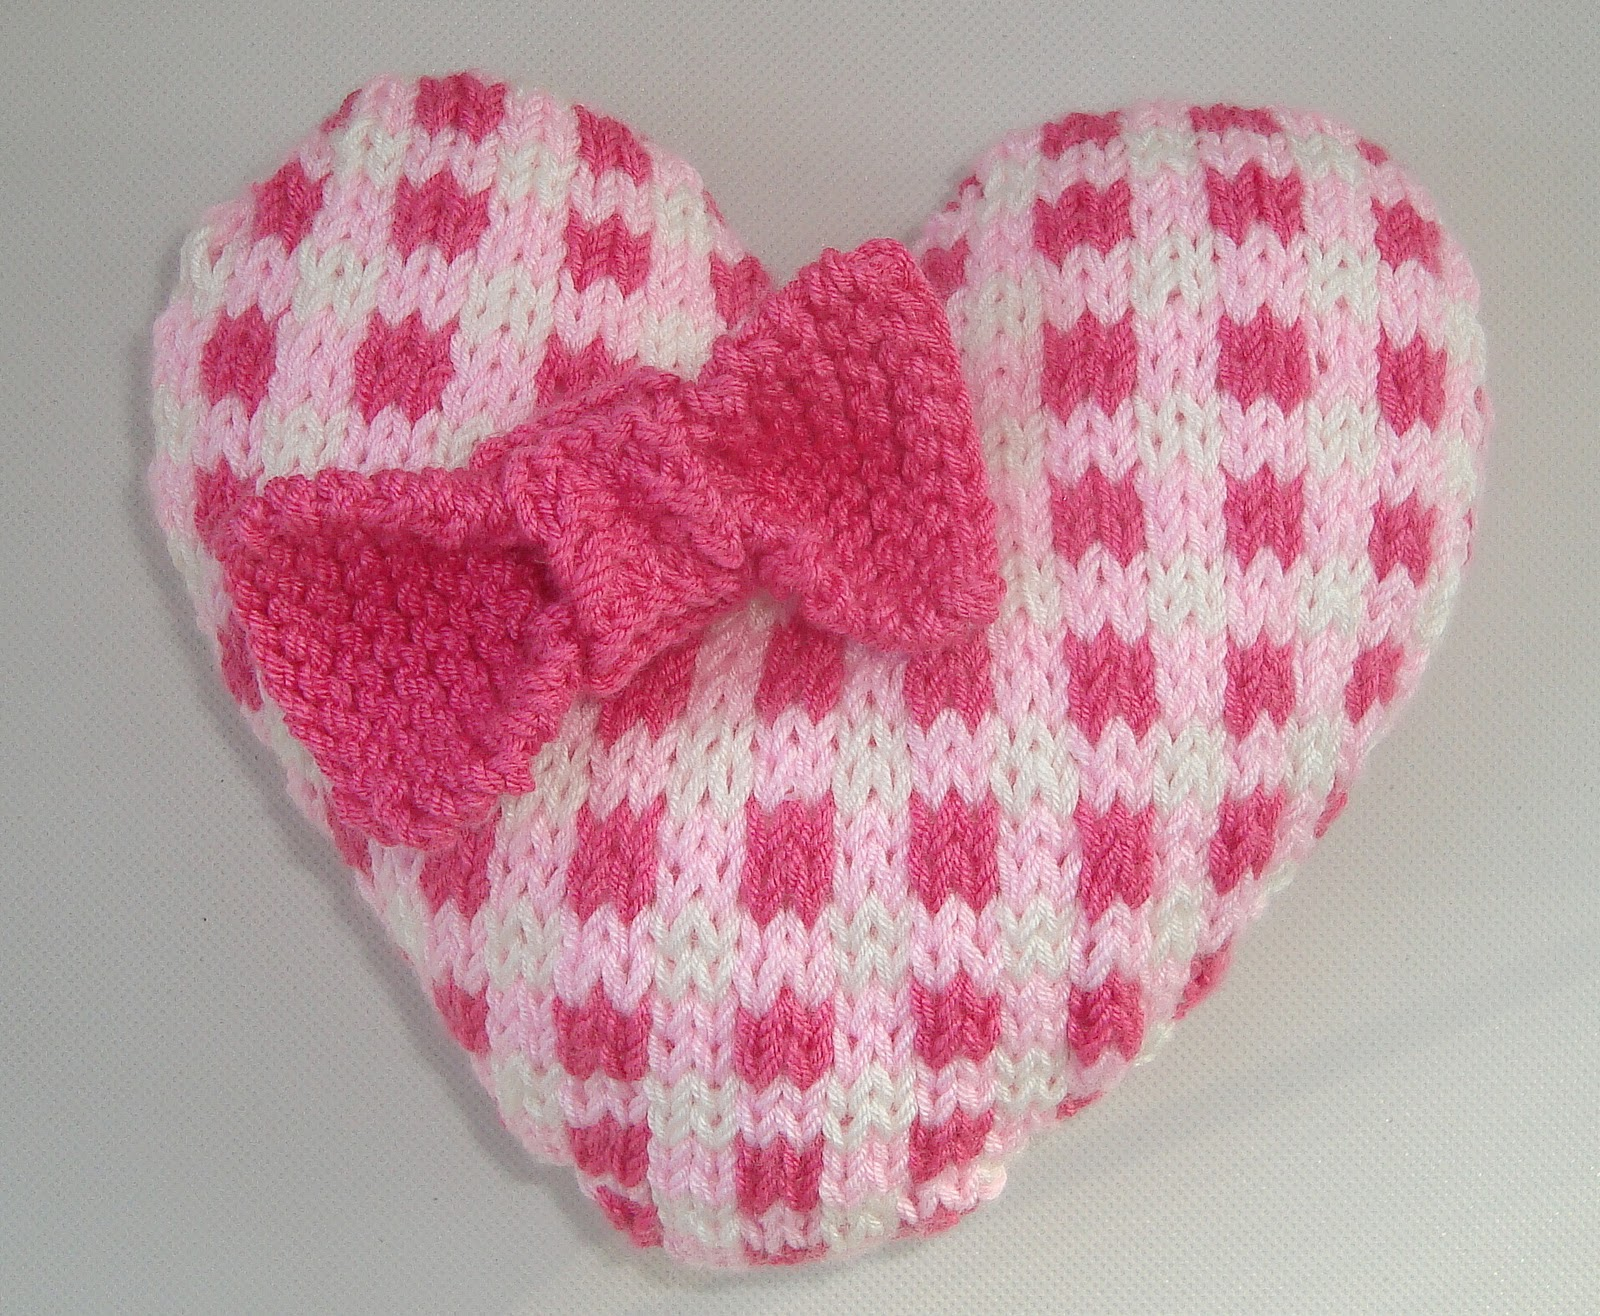 Shabby Chic Gingham Heart Knitting Pattern